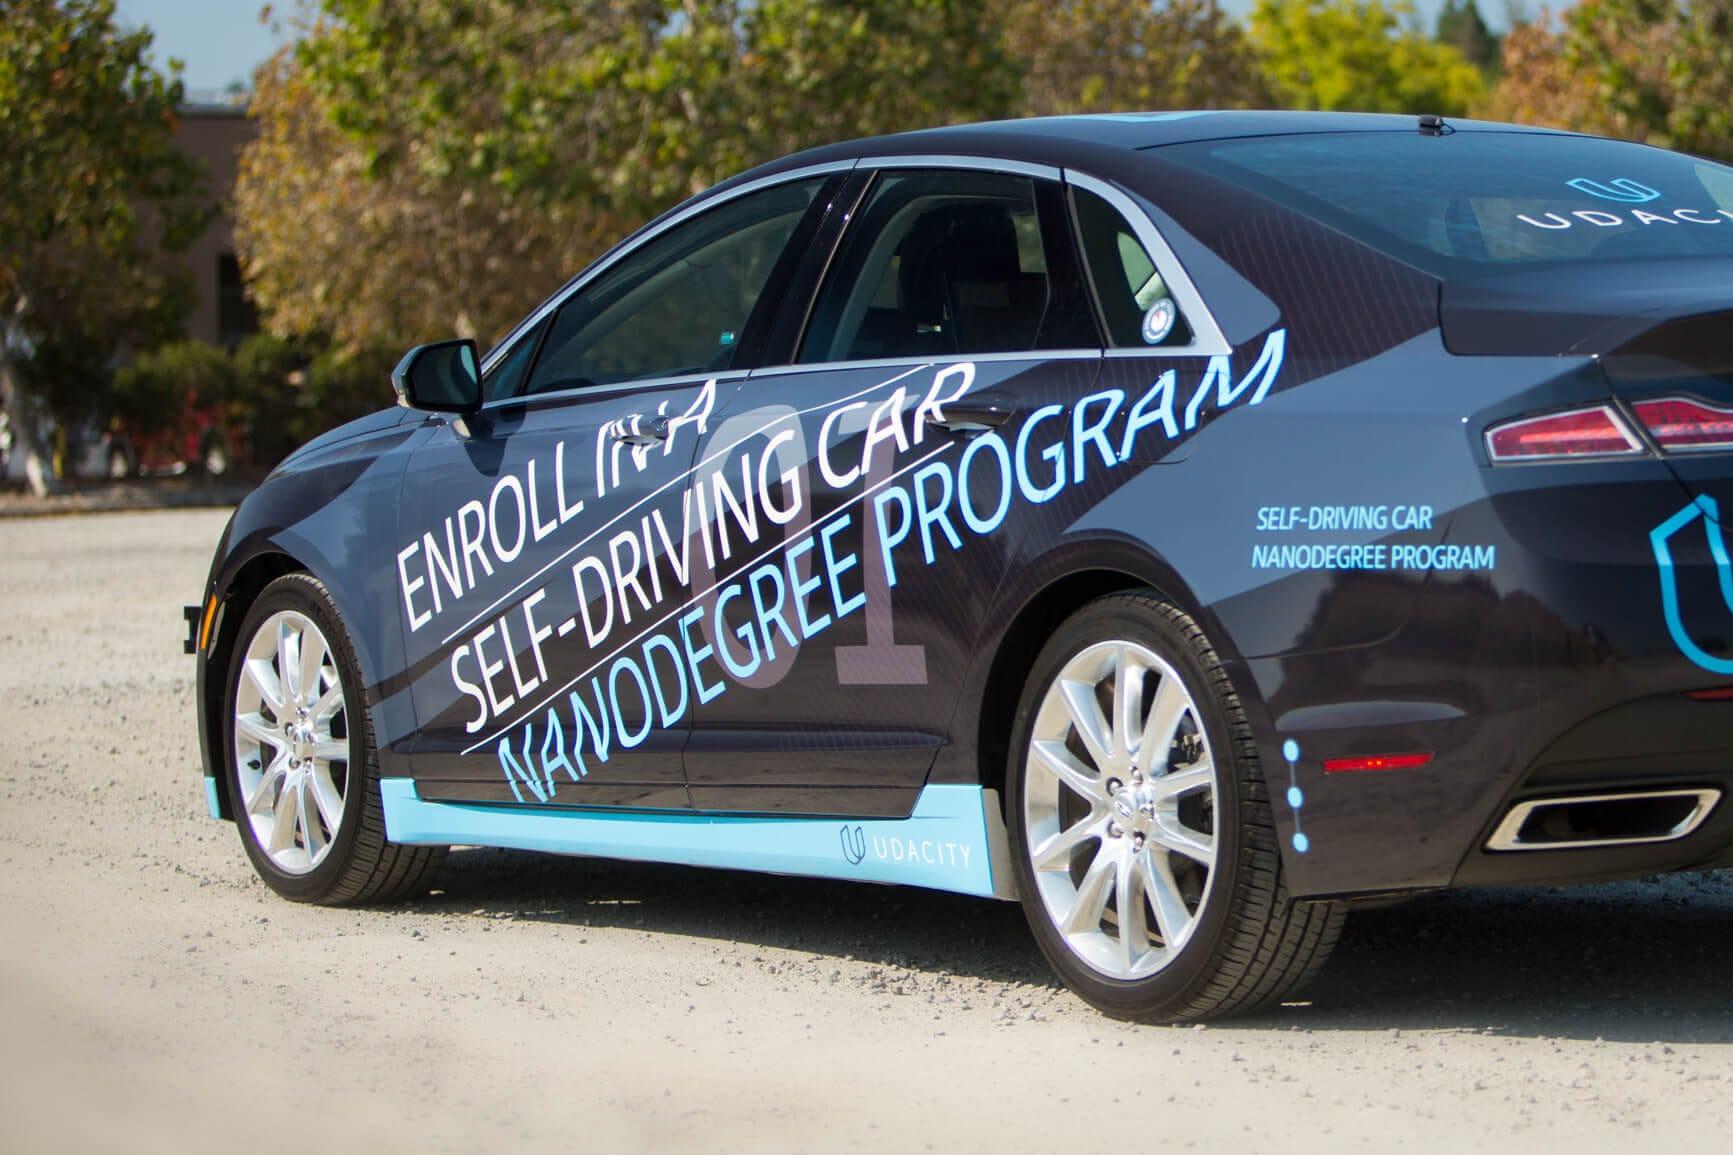 Self-Driving Car Engineer Nanodegree